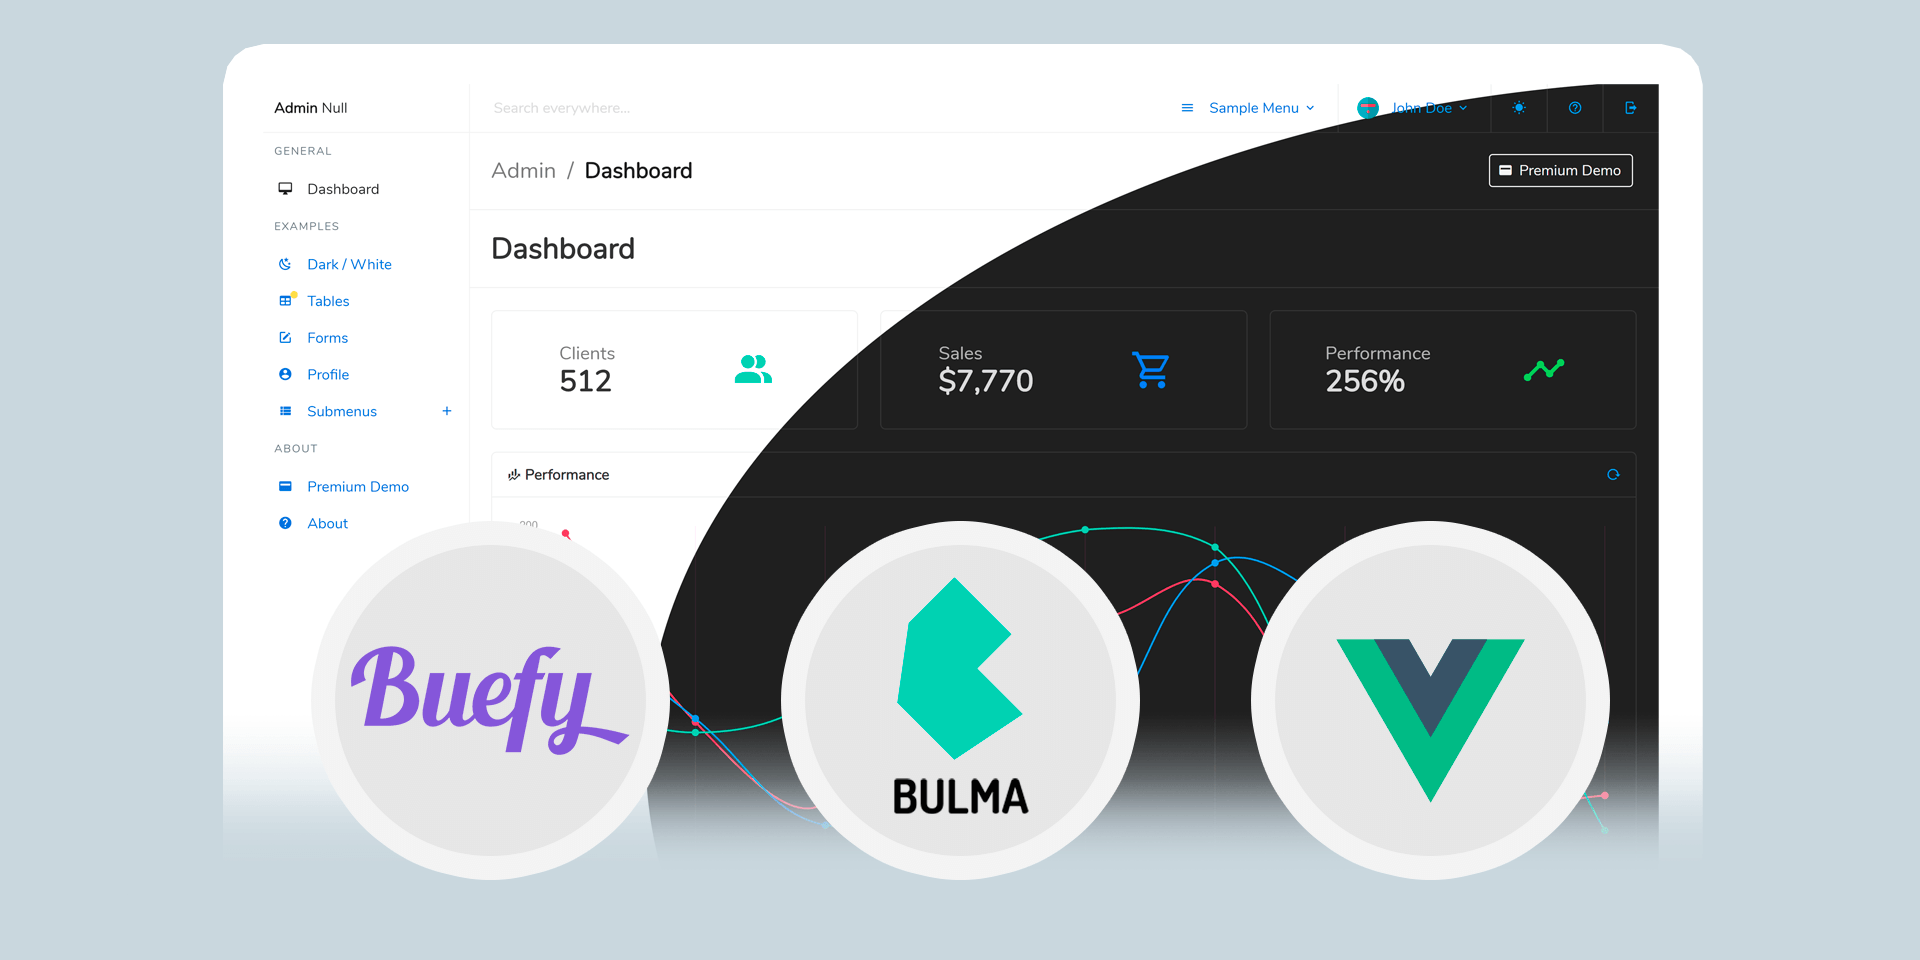 Admin Null - Free Vue.js Bulma Admin Dashboard with dark mode